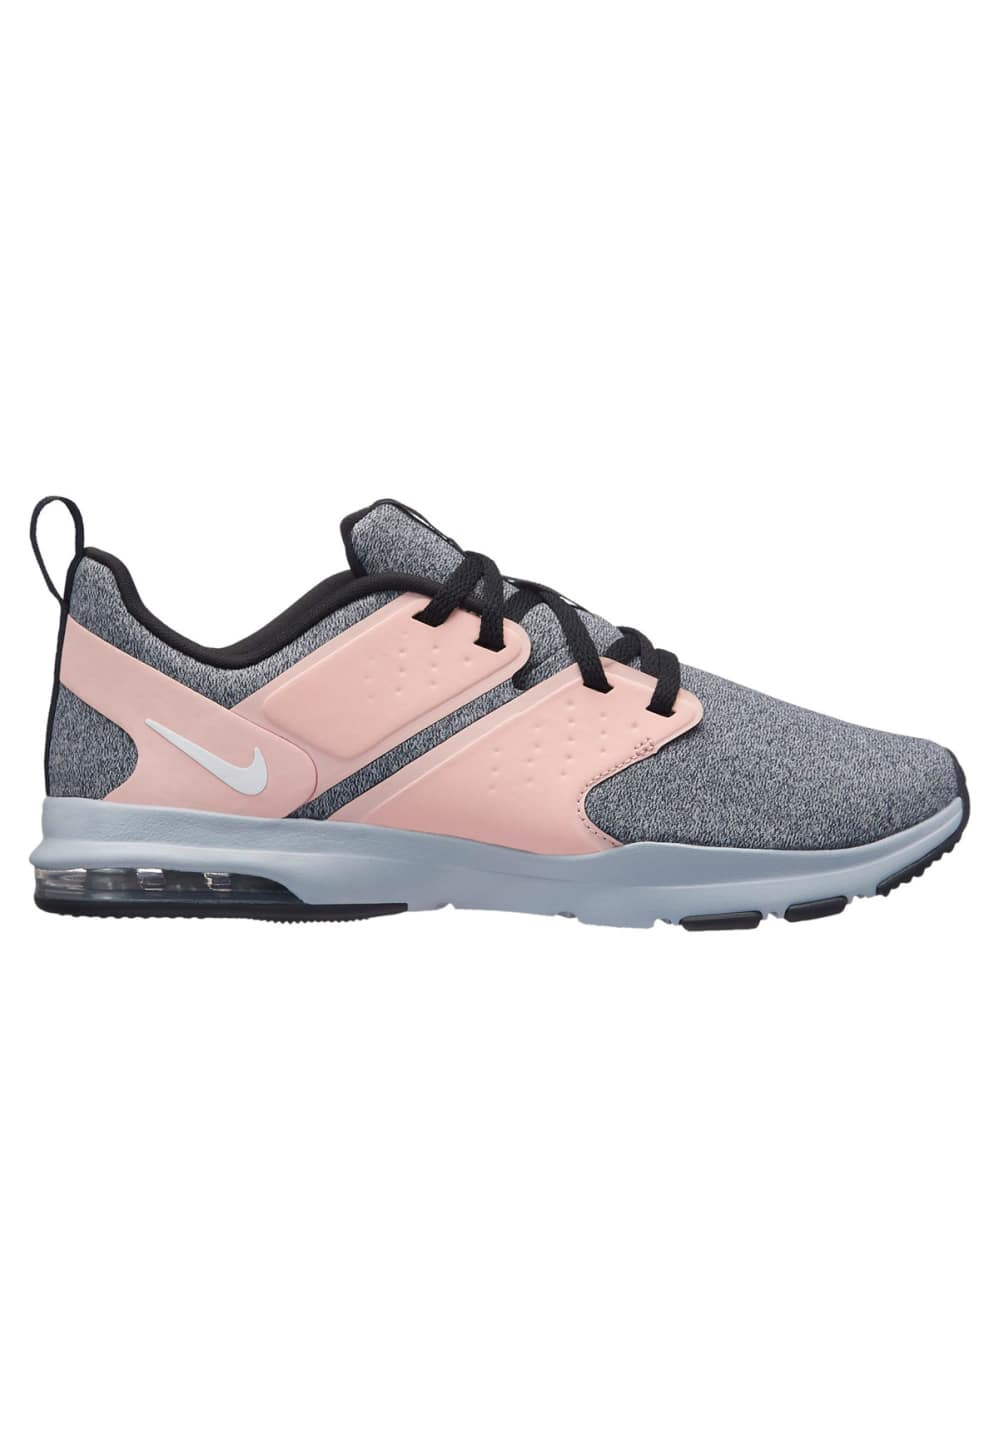 Nike Air Bella TR - Fitnessschuhe für Damen - Grau